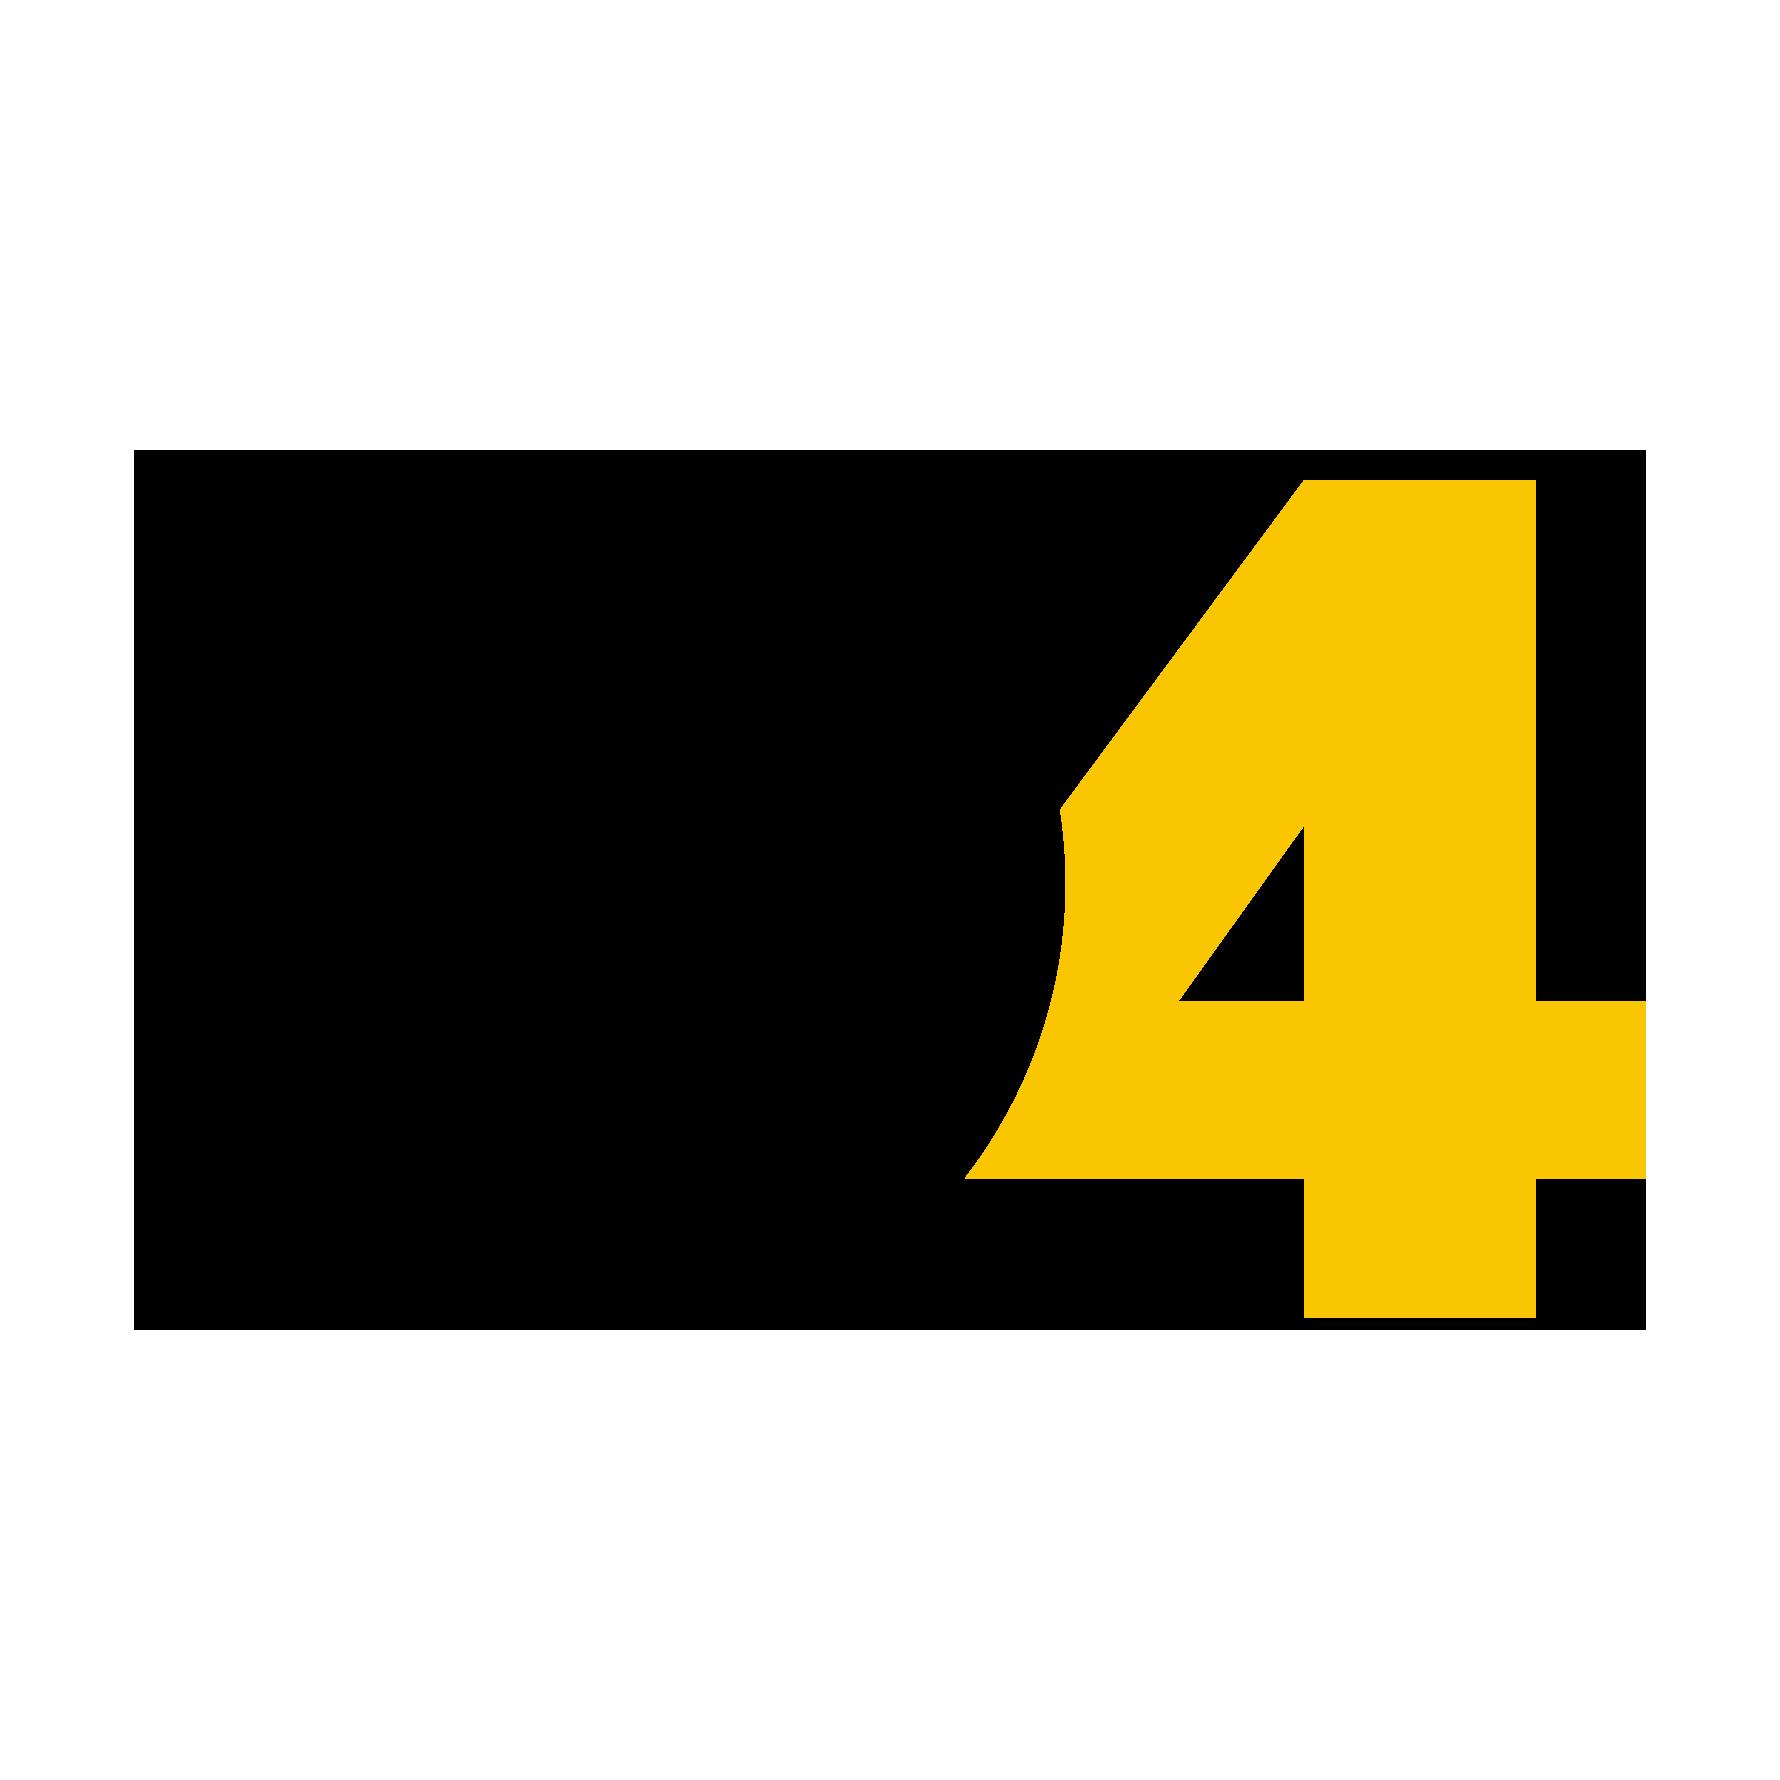 G4-Logo-Transparent.png